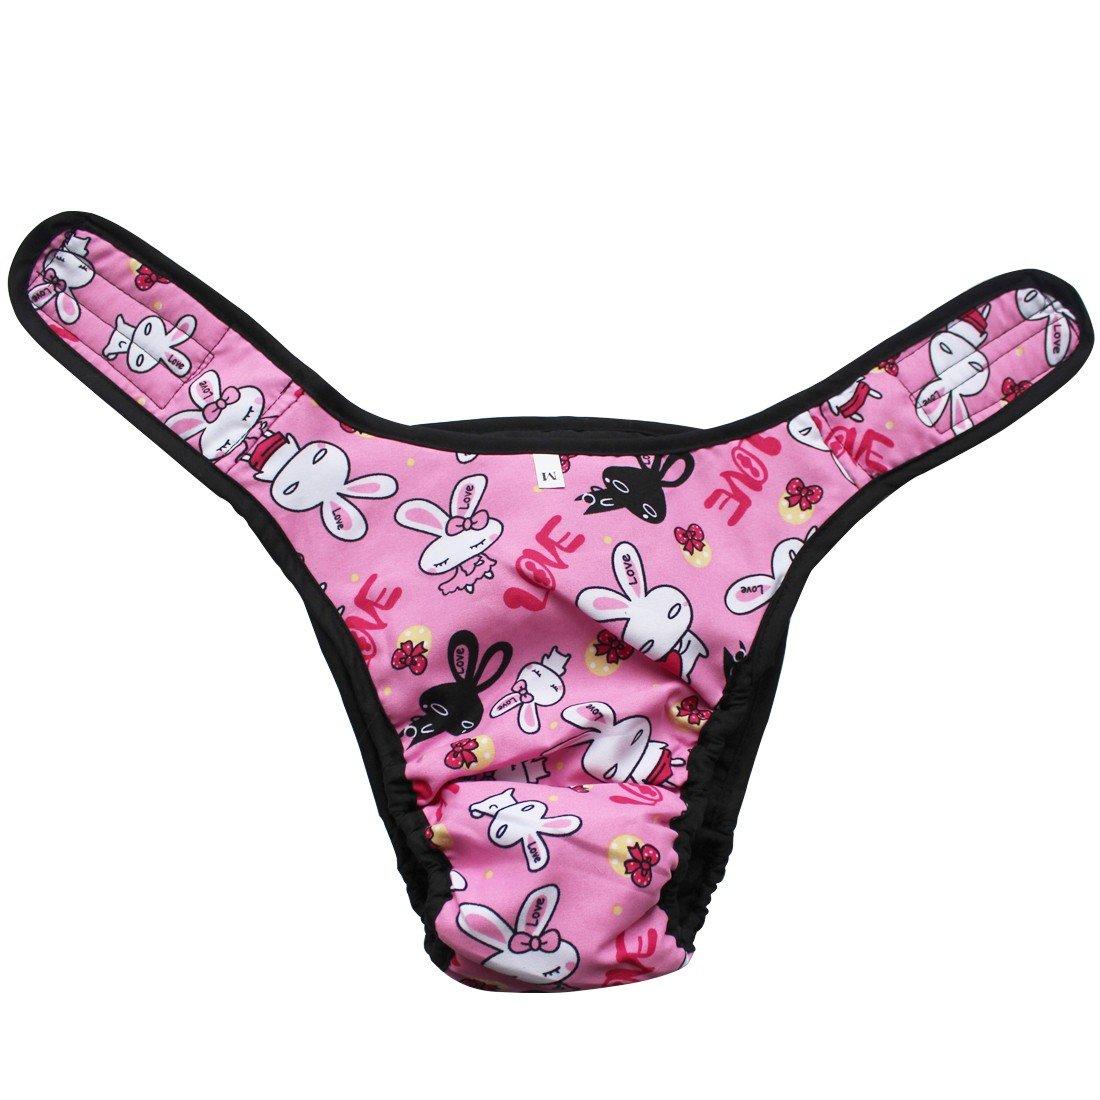 TiaoBug Reusable Washable Female Dog Pants Season Heat Menstruation Period Knickers Bitch Sanitary Nappy Underwear Briefs Pink M